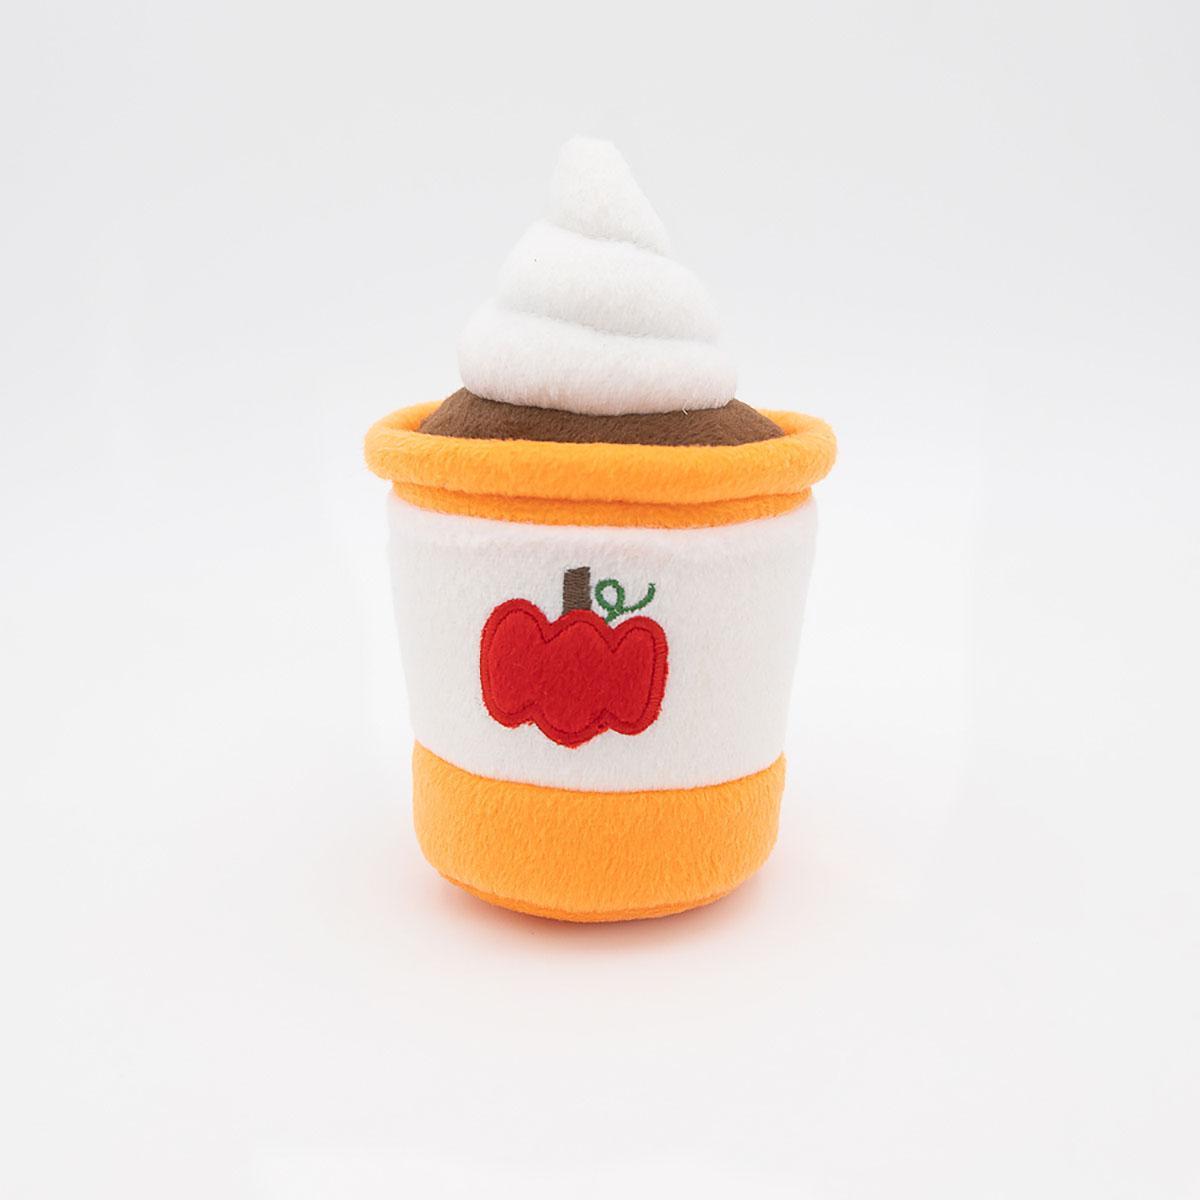 ZippyPaws NomNomz Dog Toy - Pumpkin Spice Latte